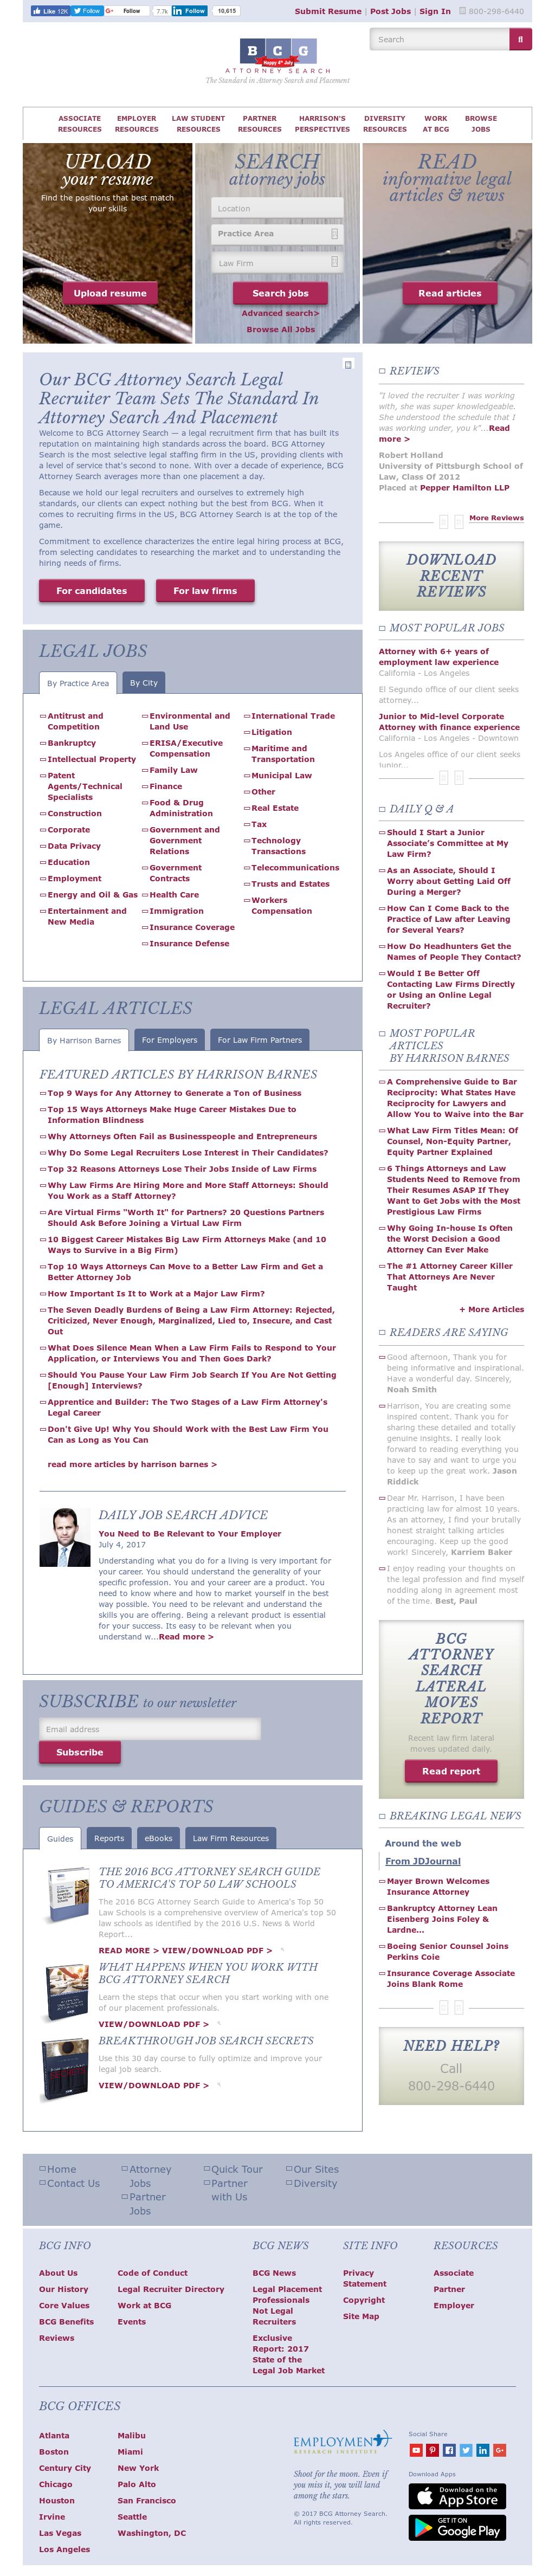 Intellectual Property Litigation Attorney Jobs